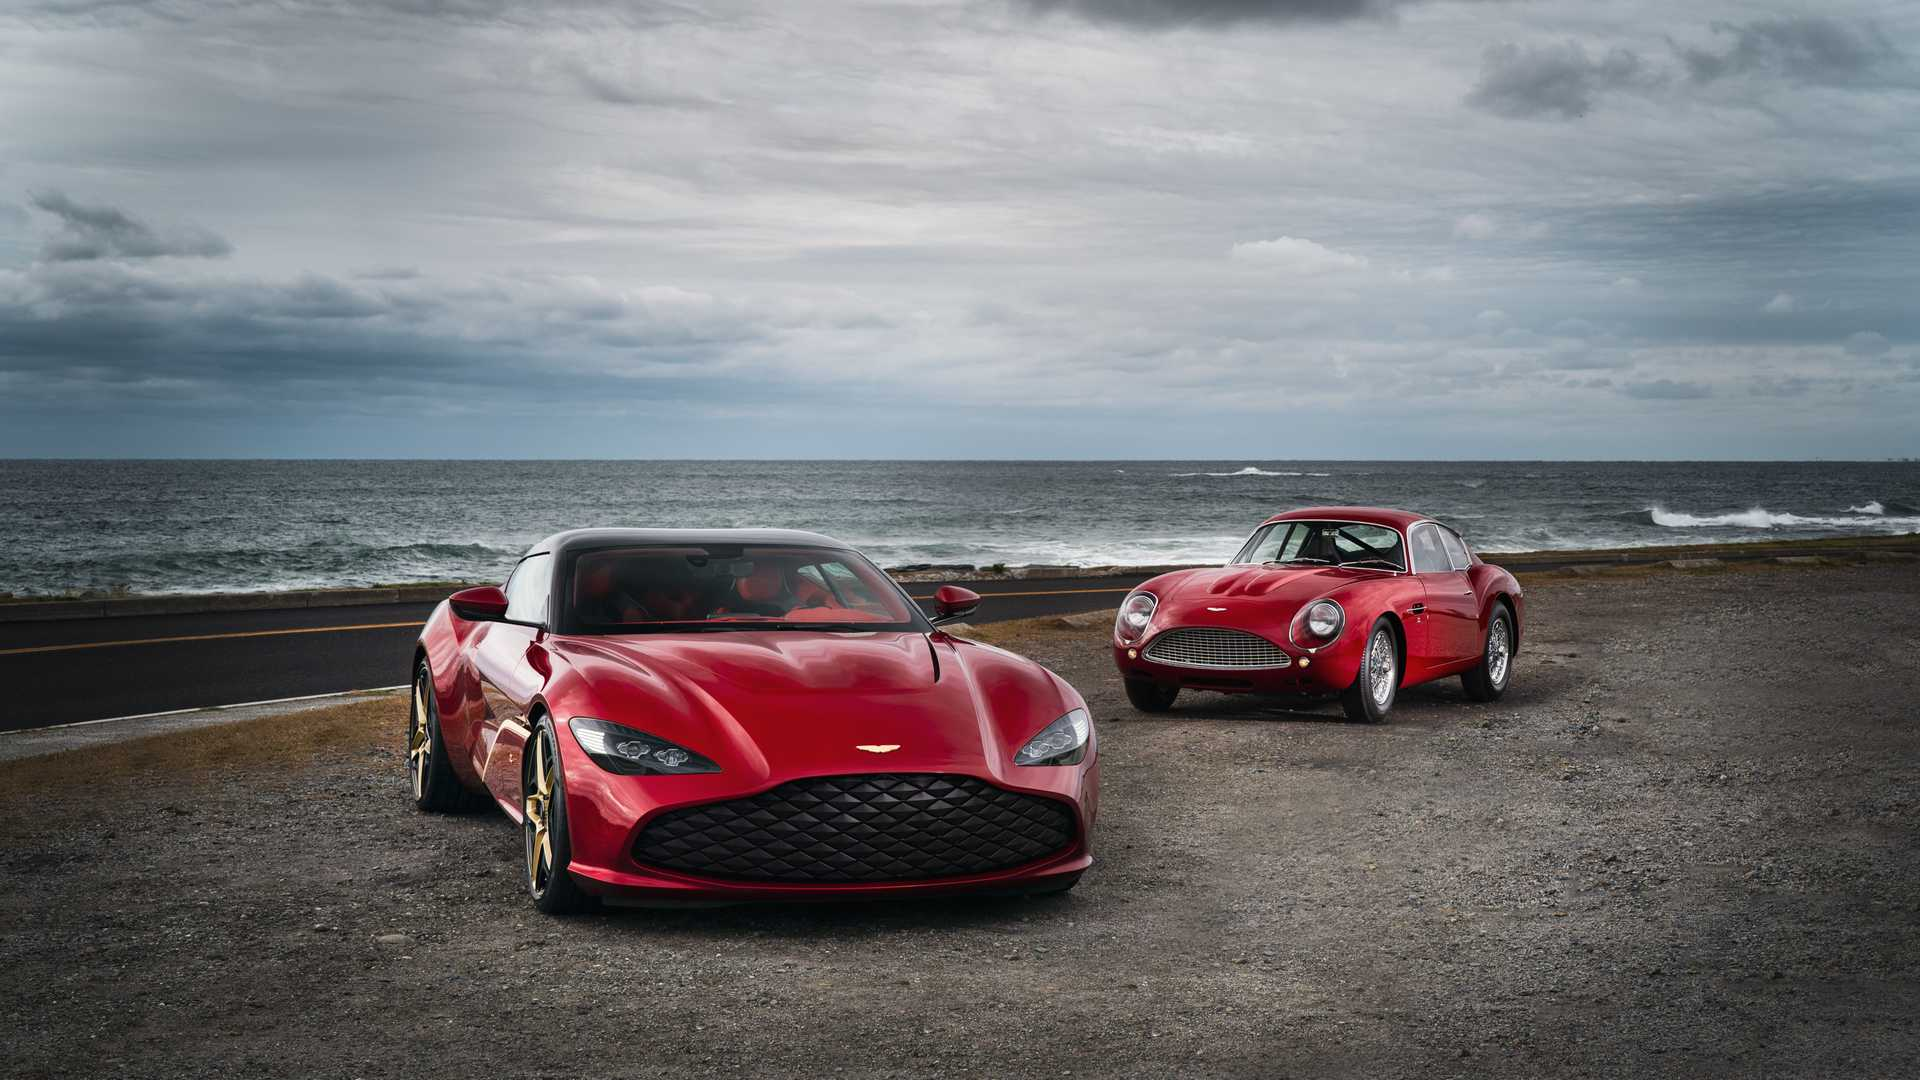 2020 Aston Martin Dbs Gt Zagato Namastecar